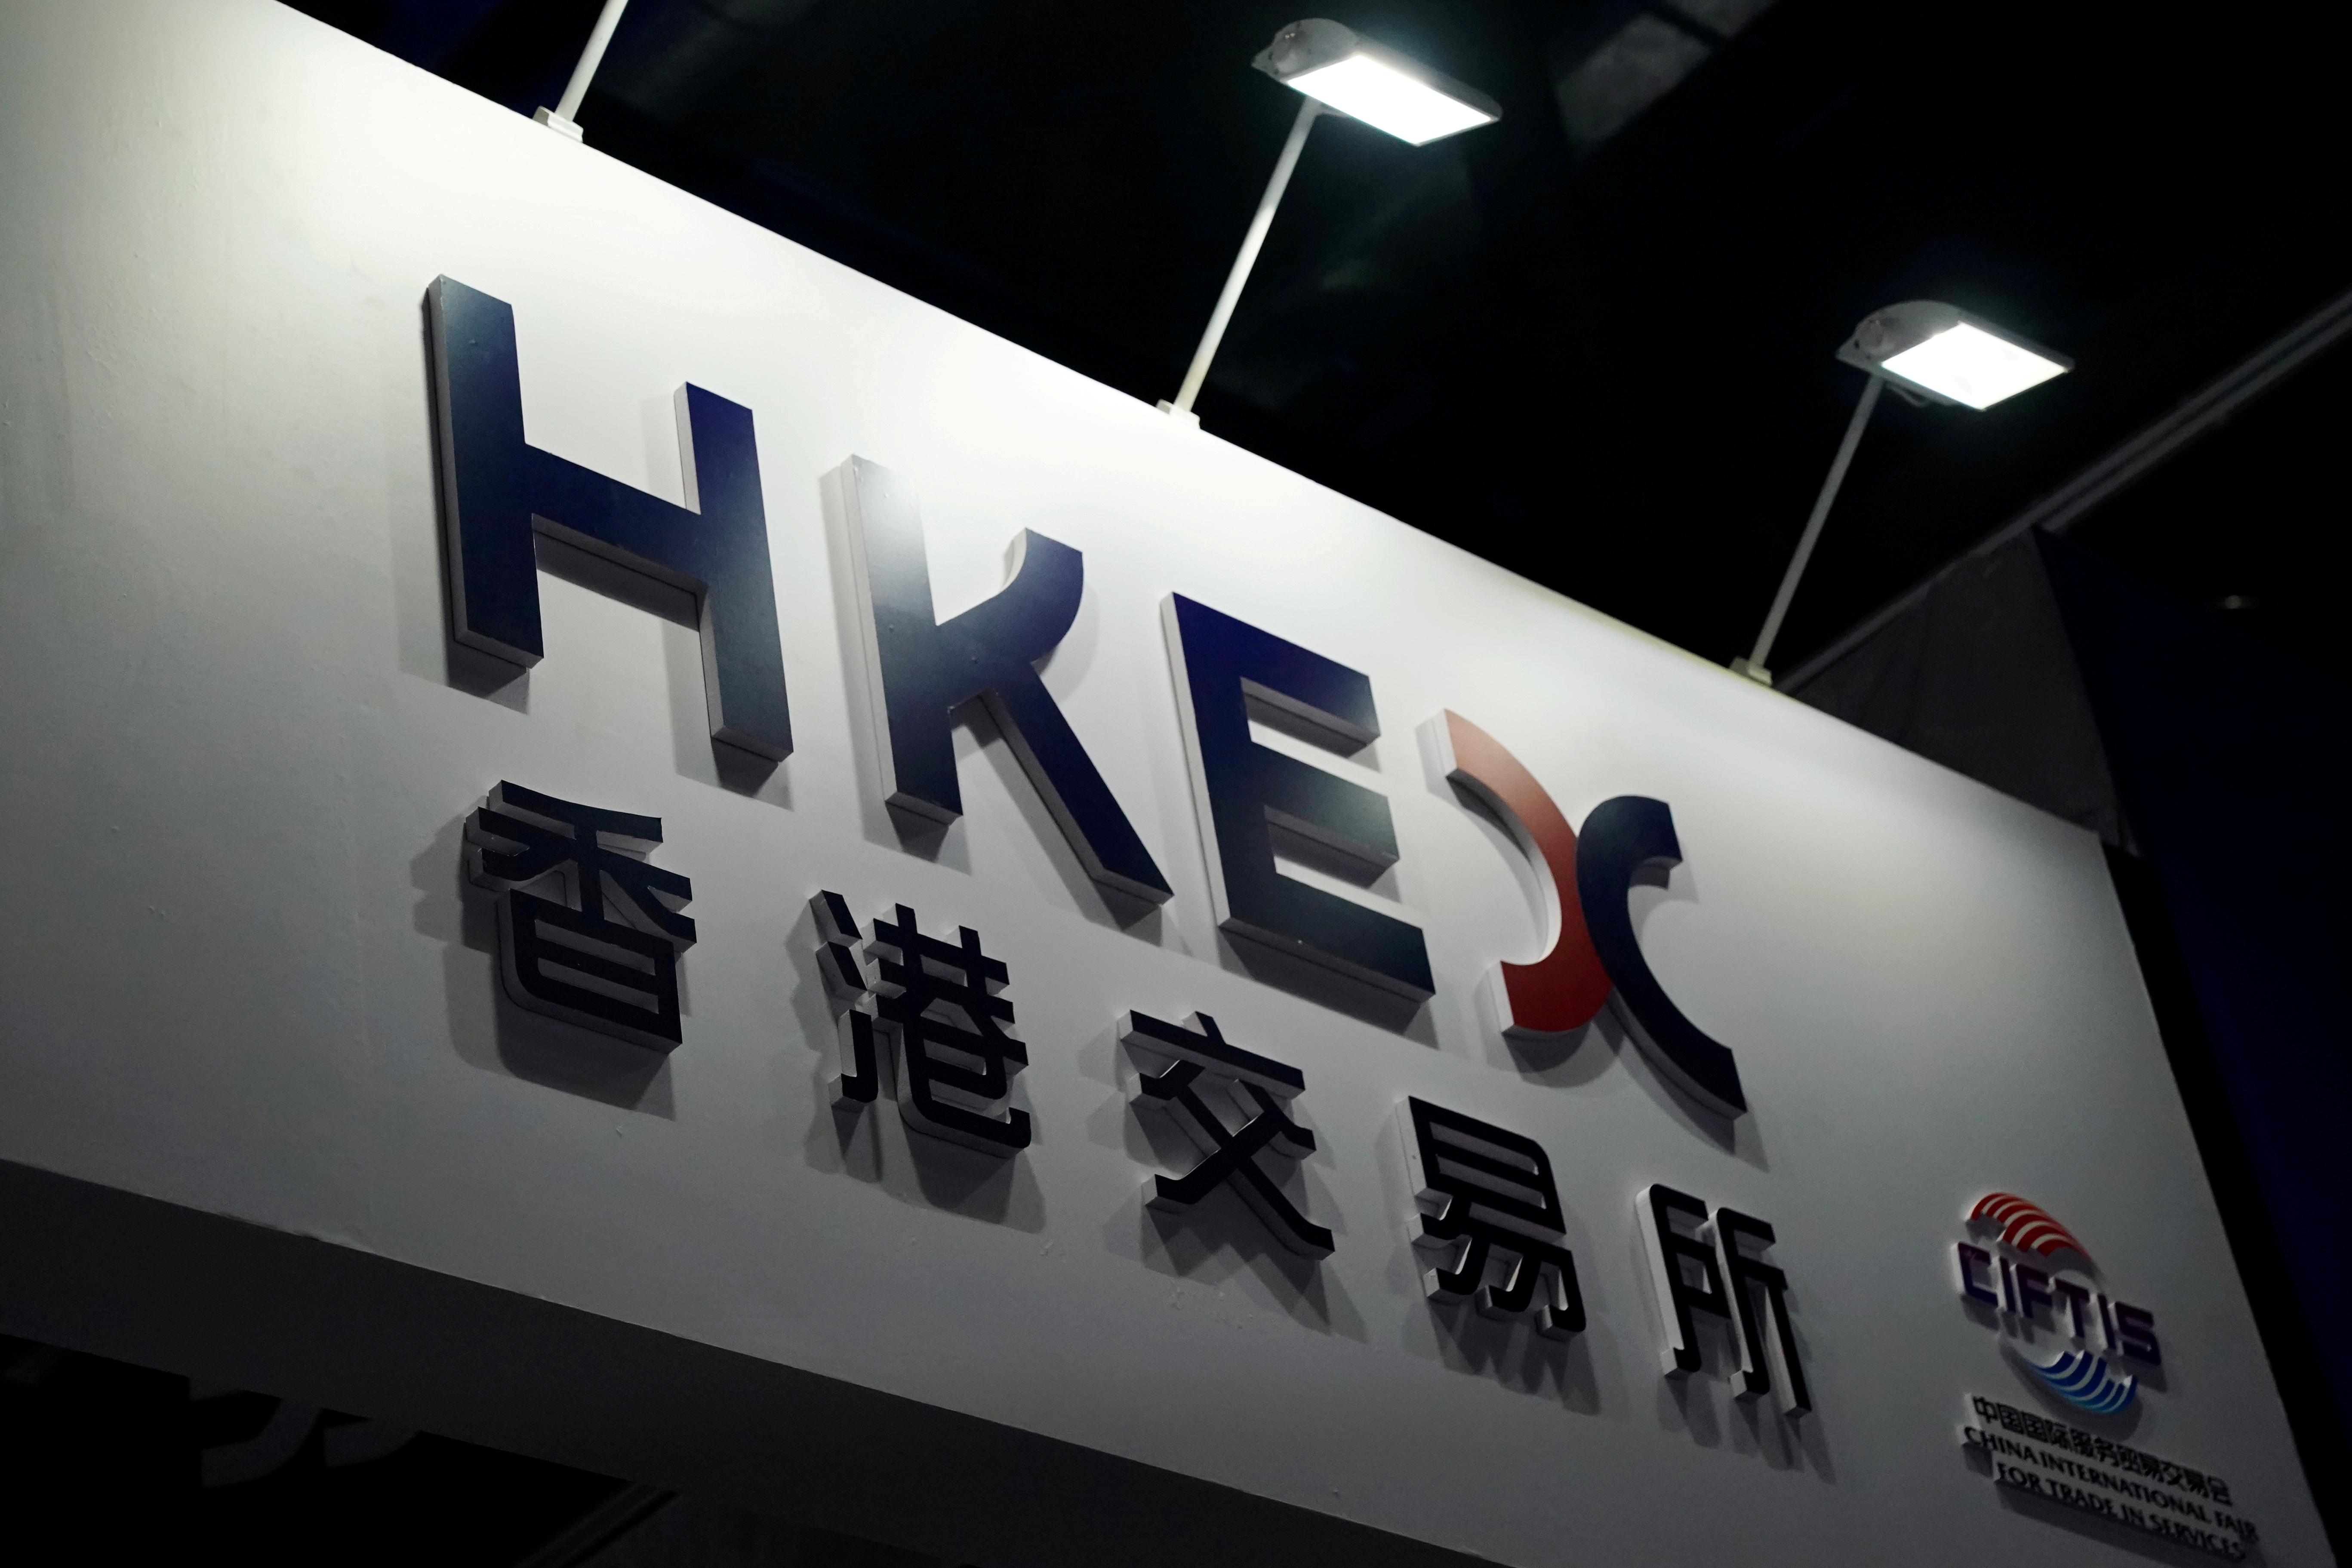 A Stock Exchange of Hong Kong (HKEX) logo in Beijing, China September 4, 2020. REUTERS/Tingshu Wang